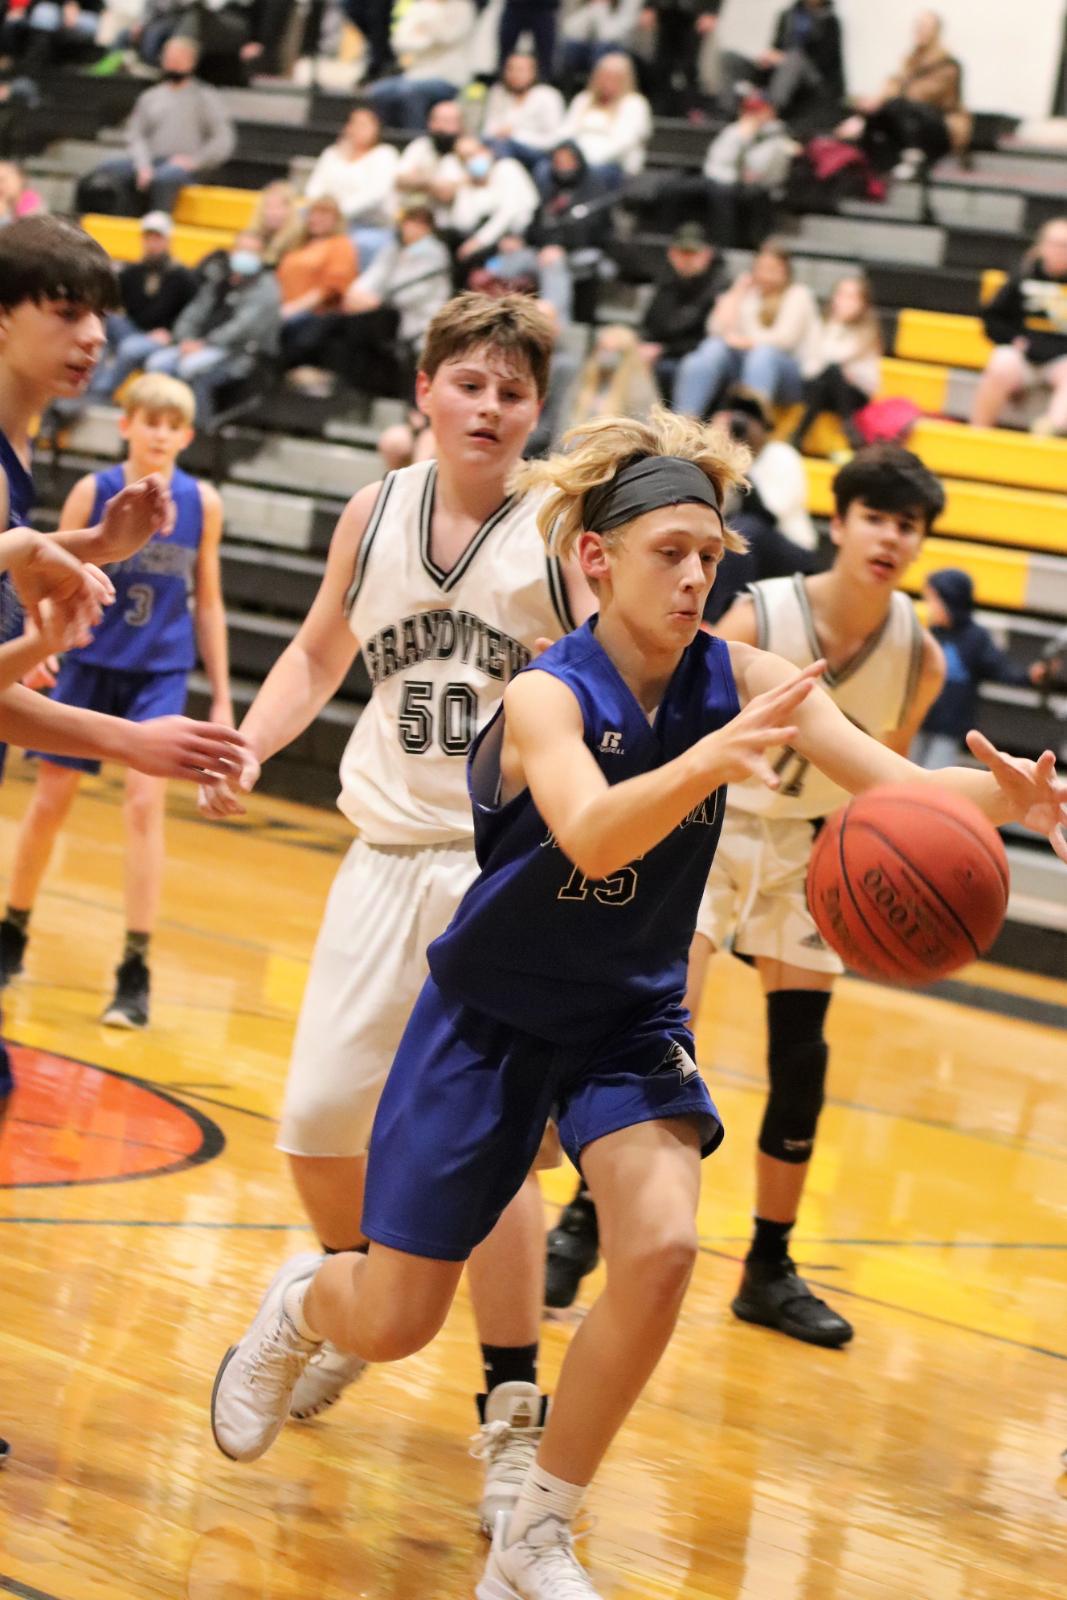 8th grade boys' basketball loses to Grandview 27-34           12/15/20